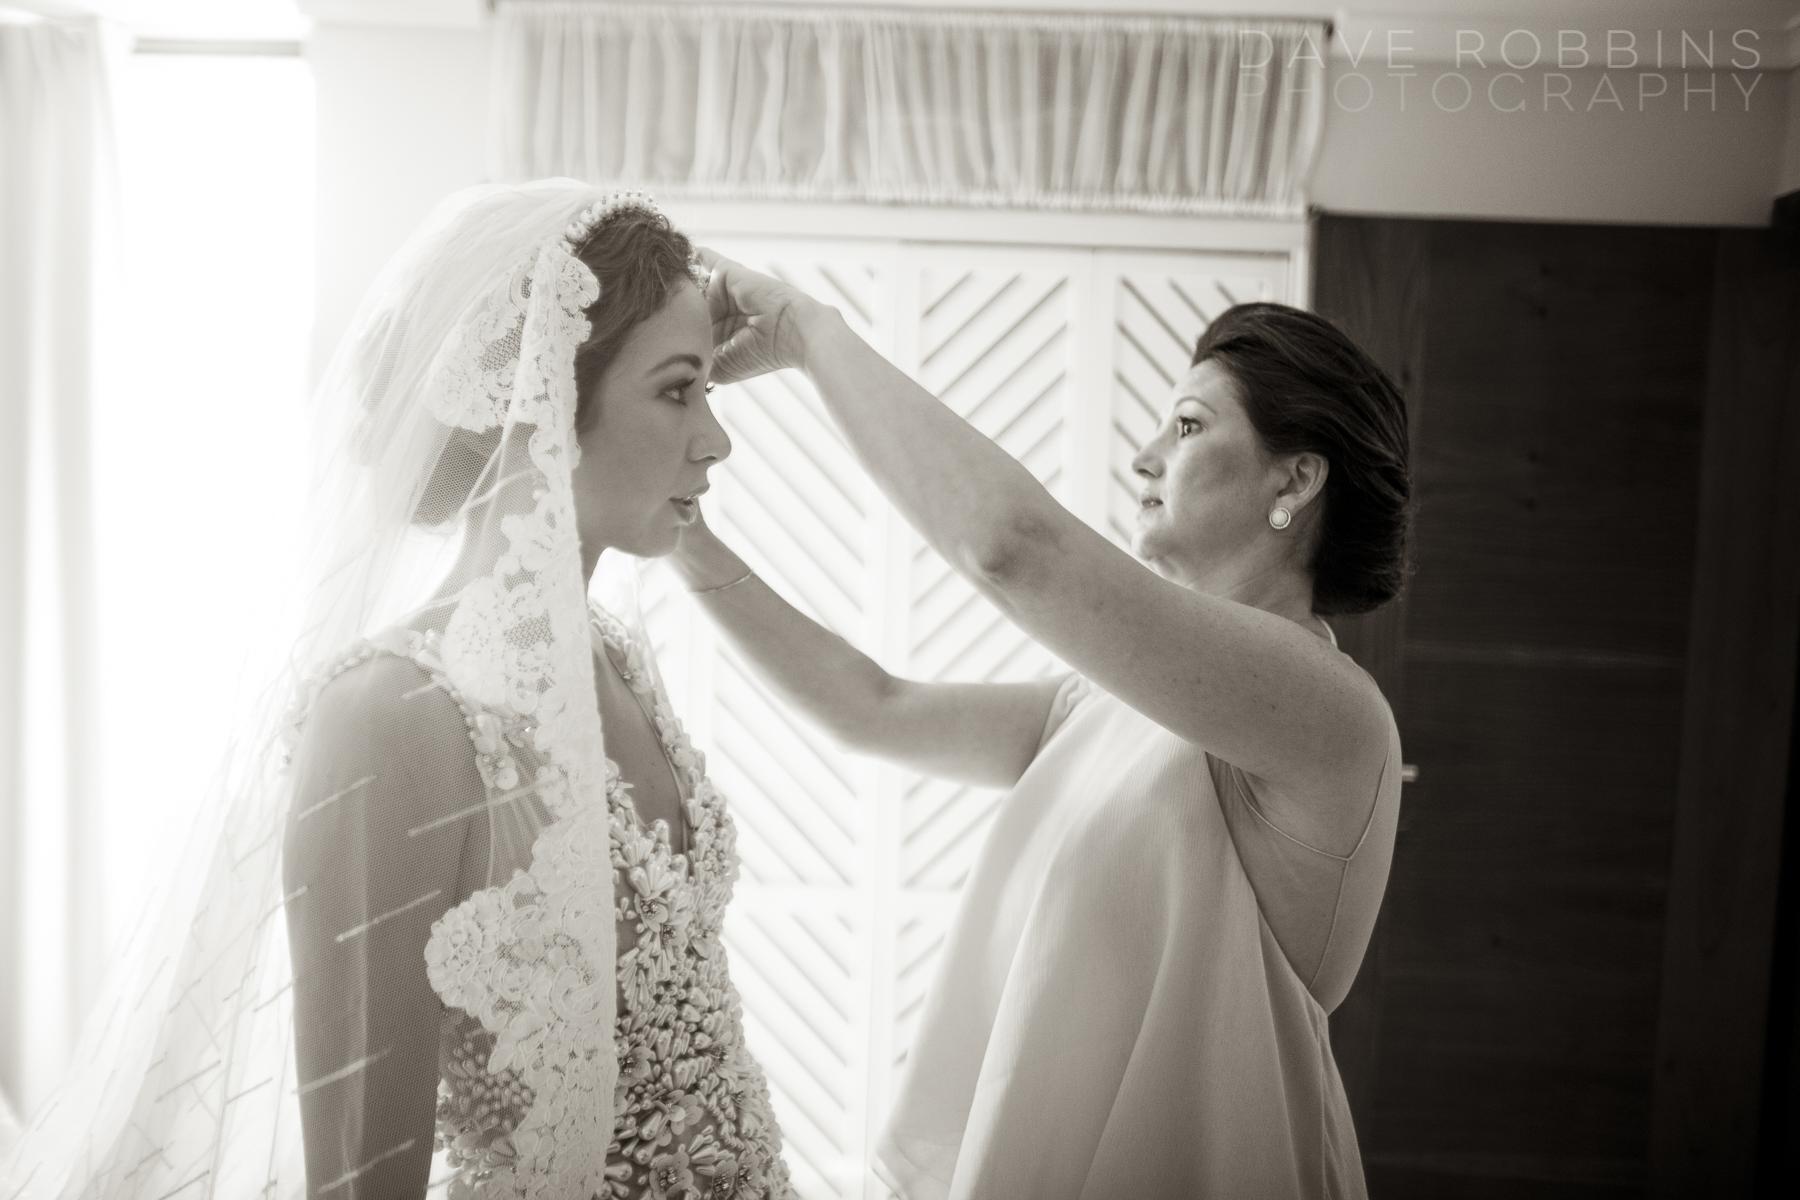 CARTAGENA WEDDING MARTHA STEWART - 0016.JPG